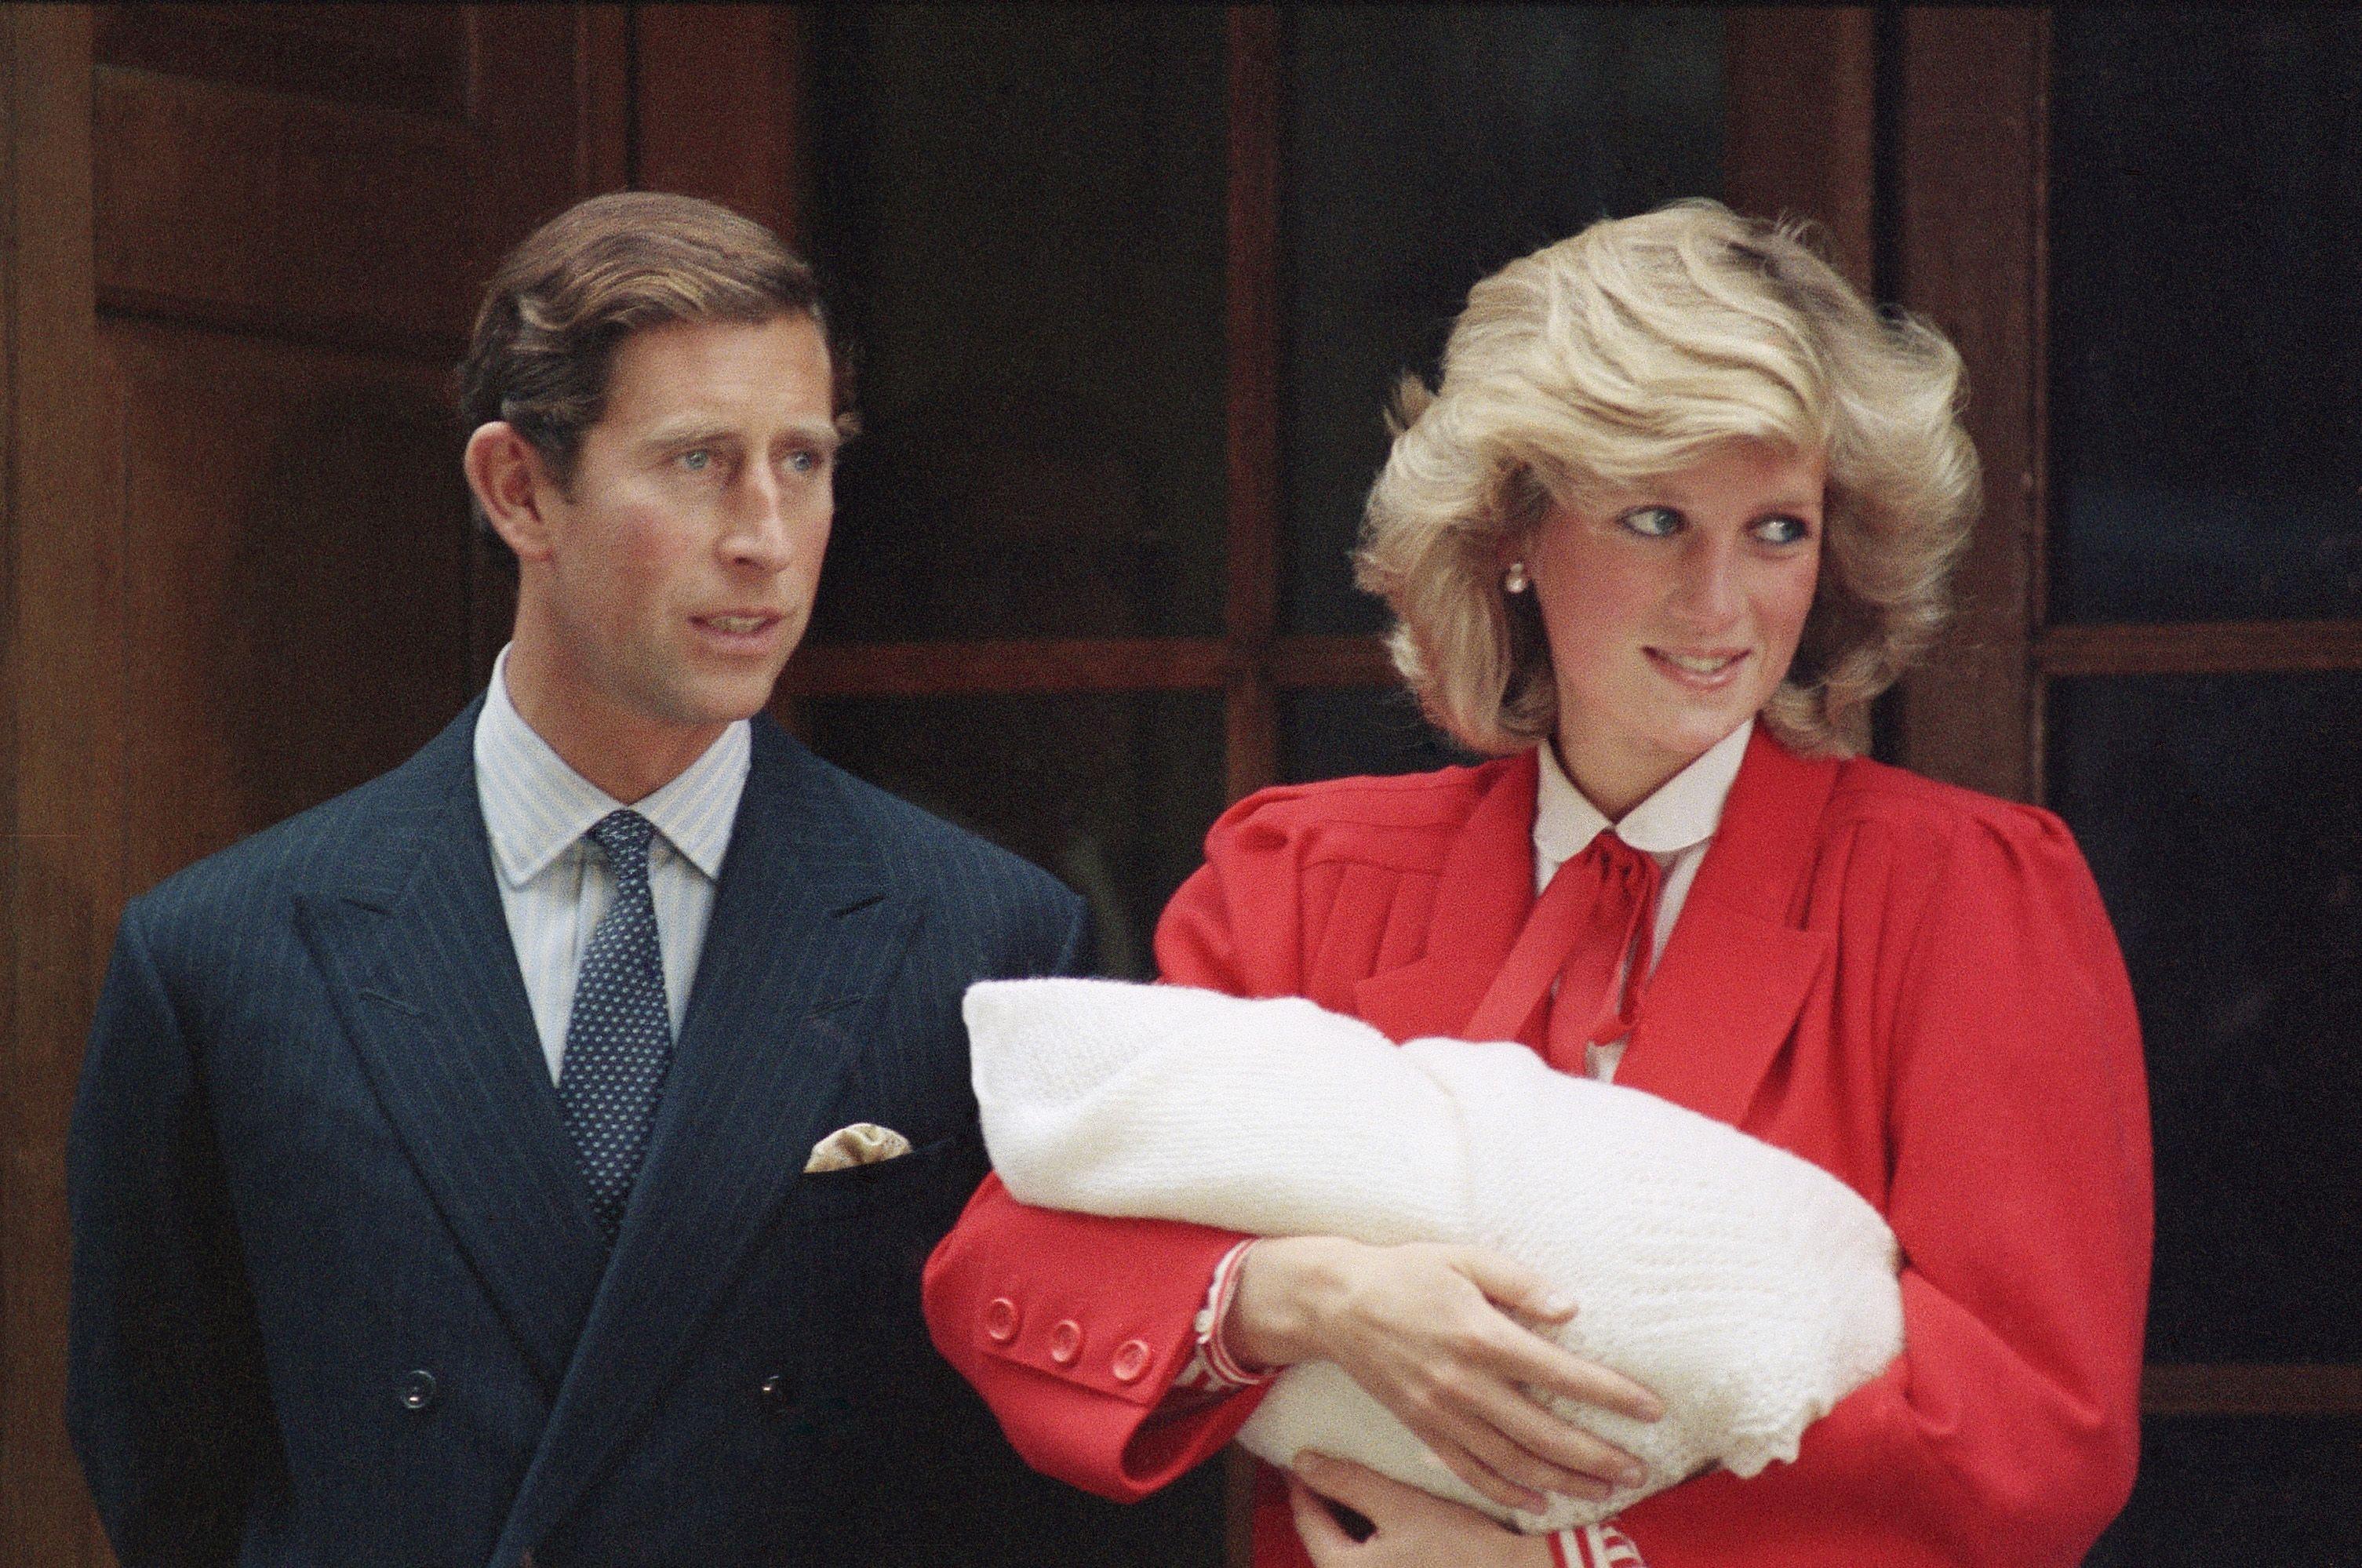 Kate Middleton & Princess Diana Both Wearing Red Dresses When ...